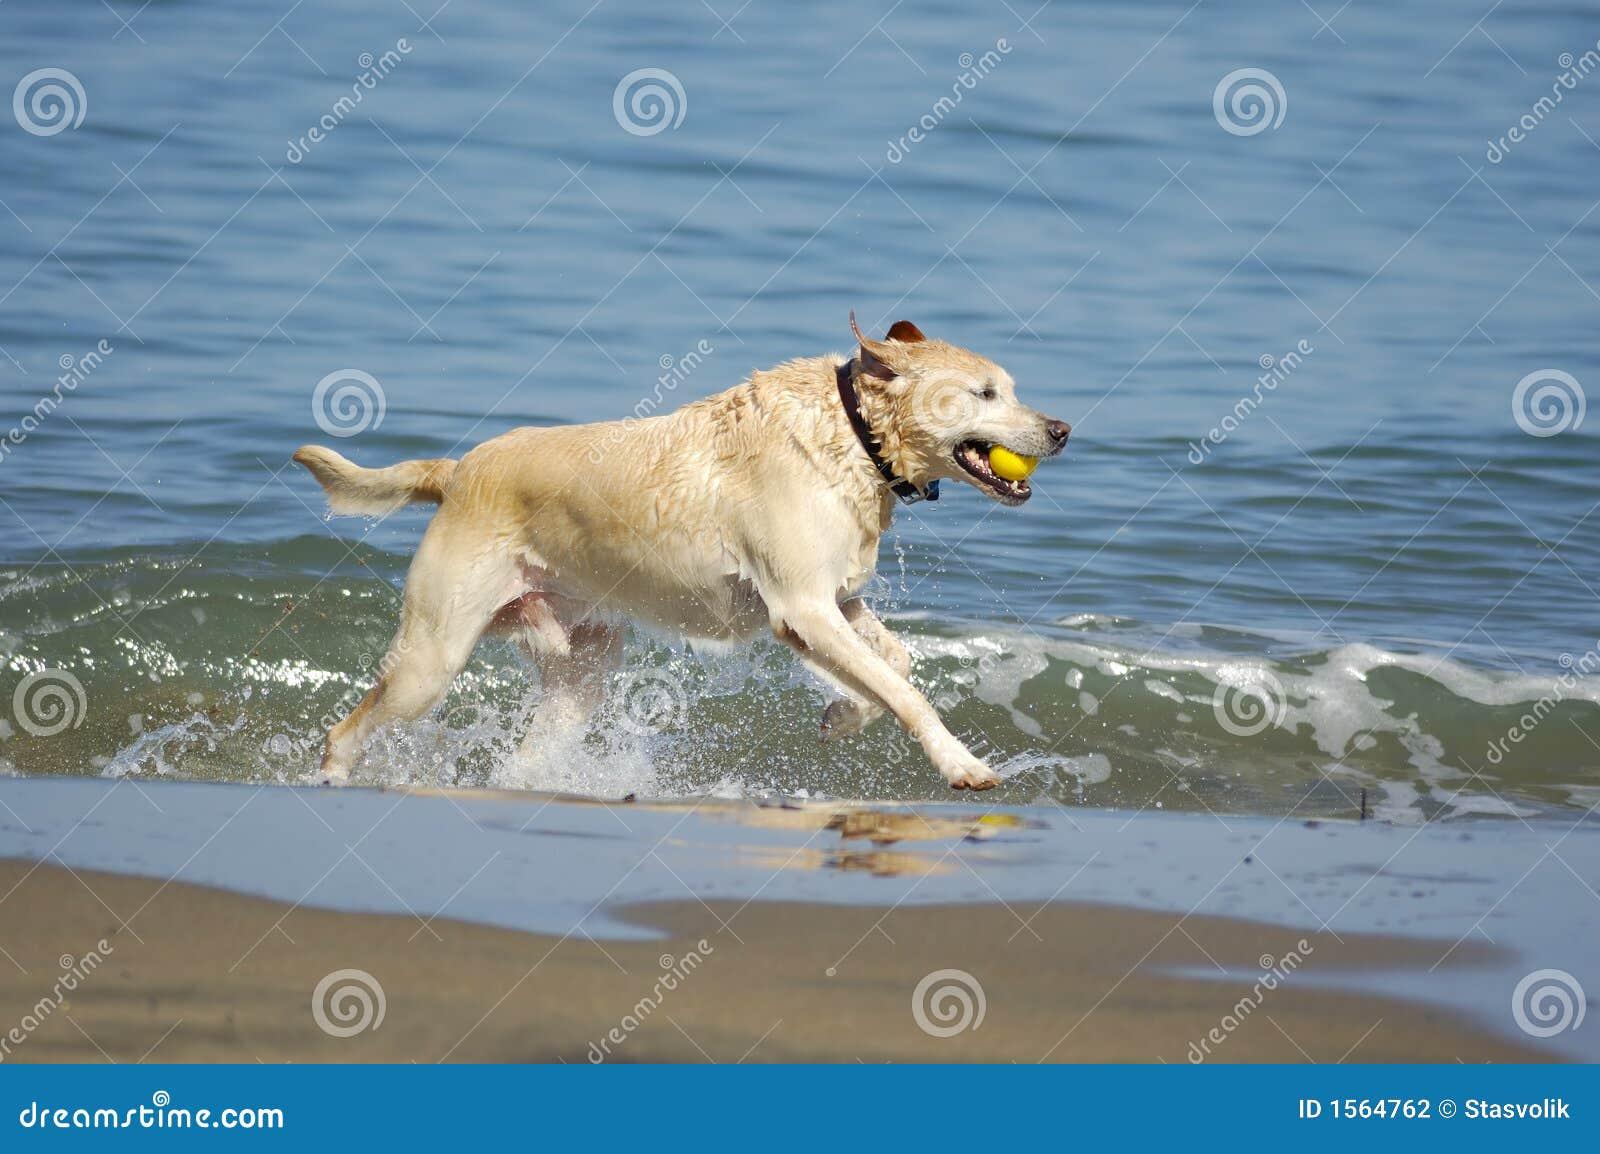 Dog running out of San Francisco Bay 3